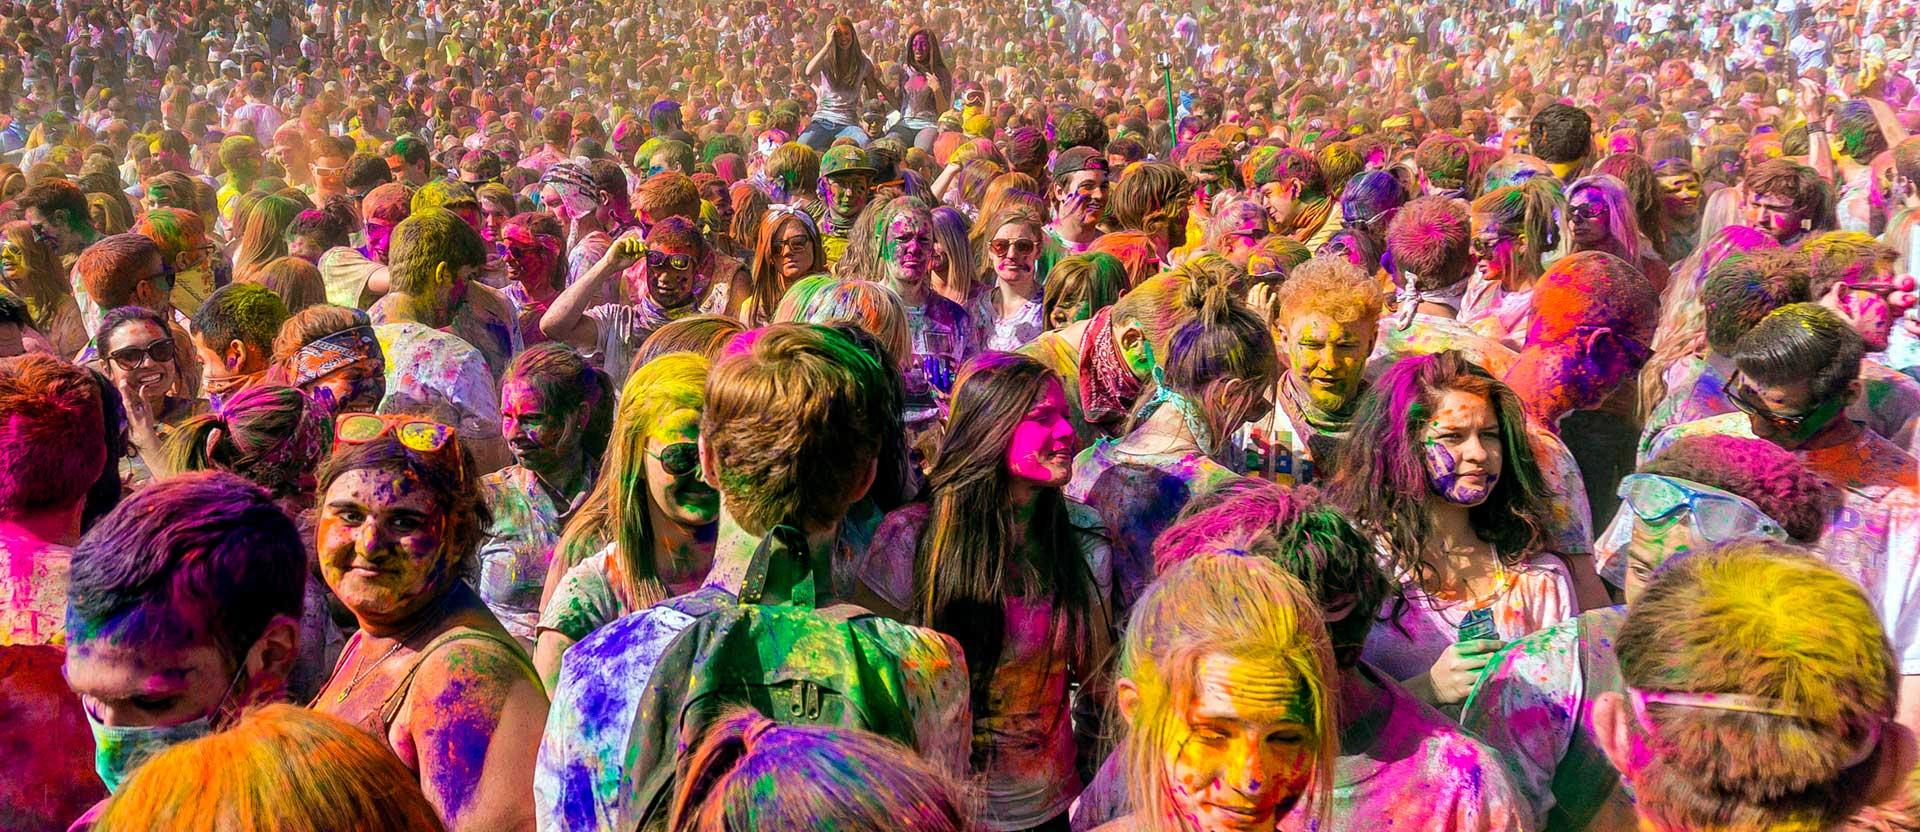 edinburgh holi one colour festival 2017